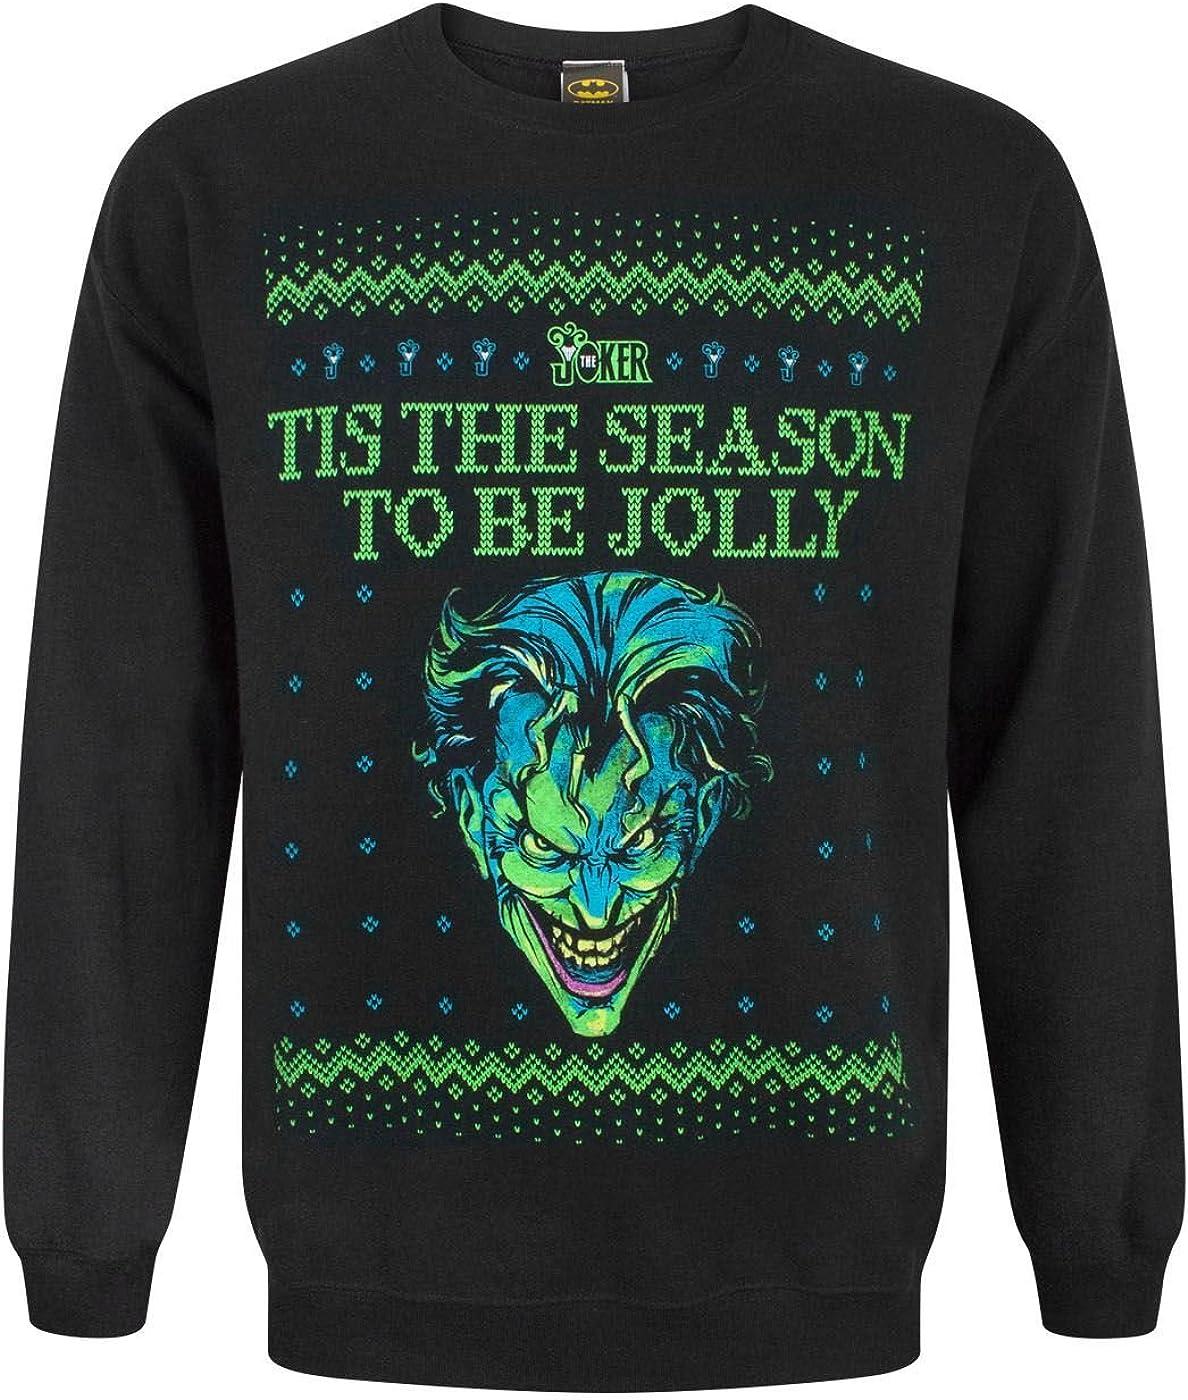 Batman Bat Sweater Ugly Christmas Sweater Sublimation Long Sleeve Shirt